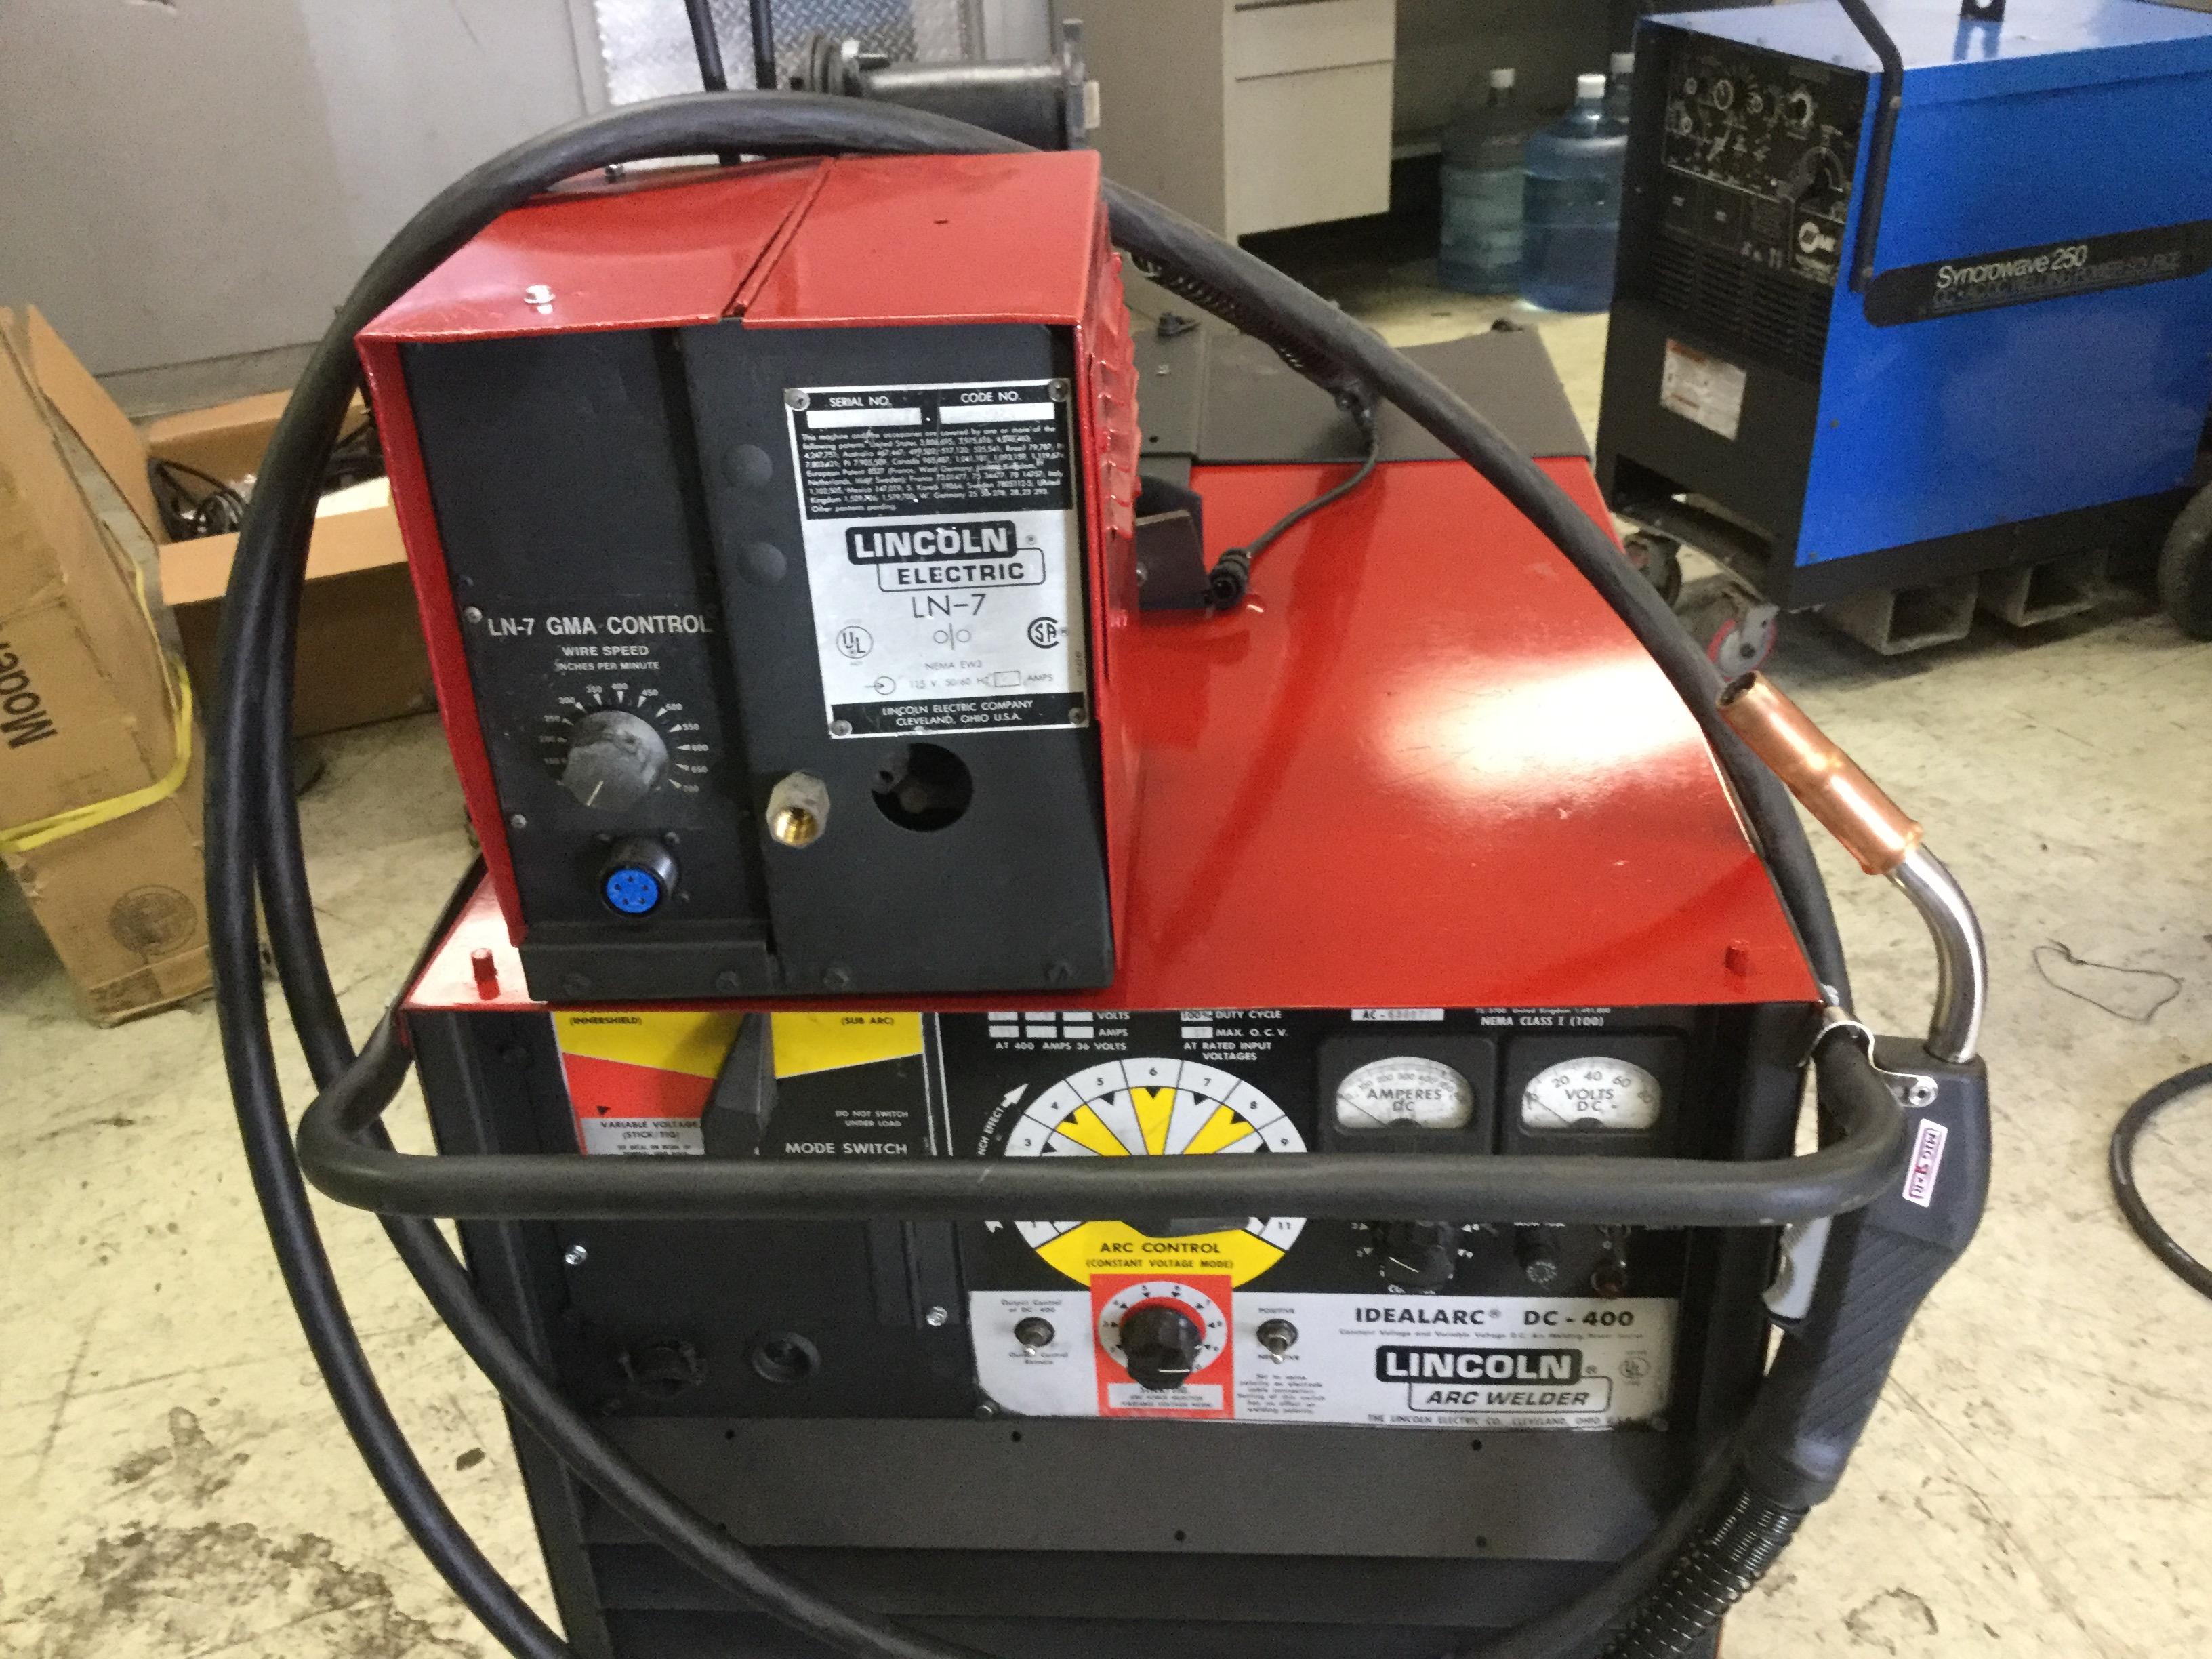 Lincoln Dc 400 Welder Cc Cv Multi Process Arc Heat Stick